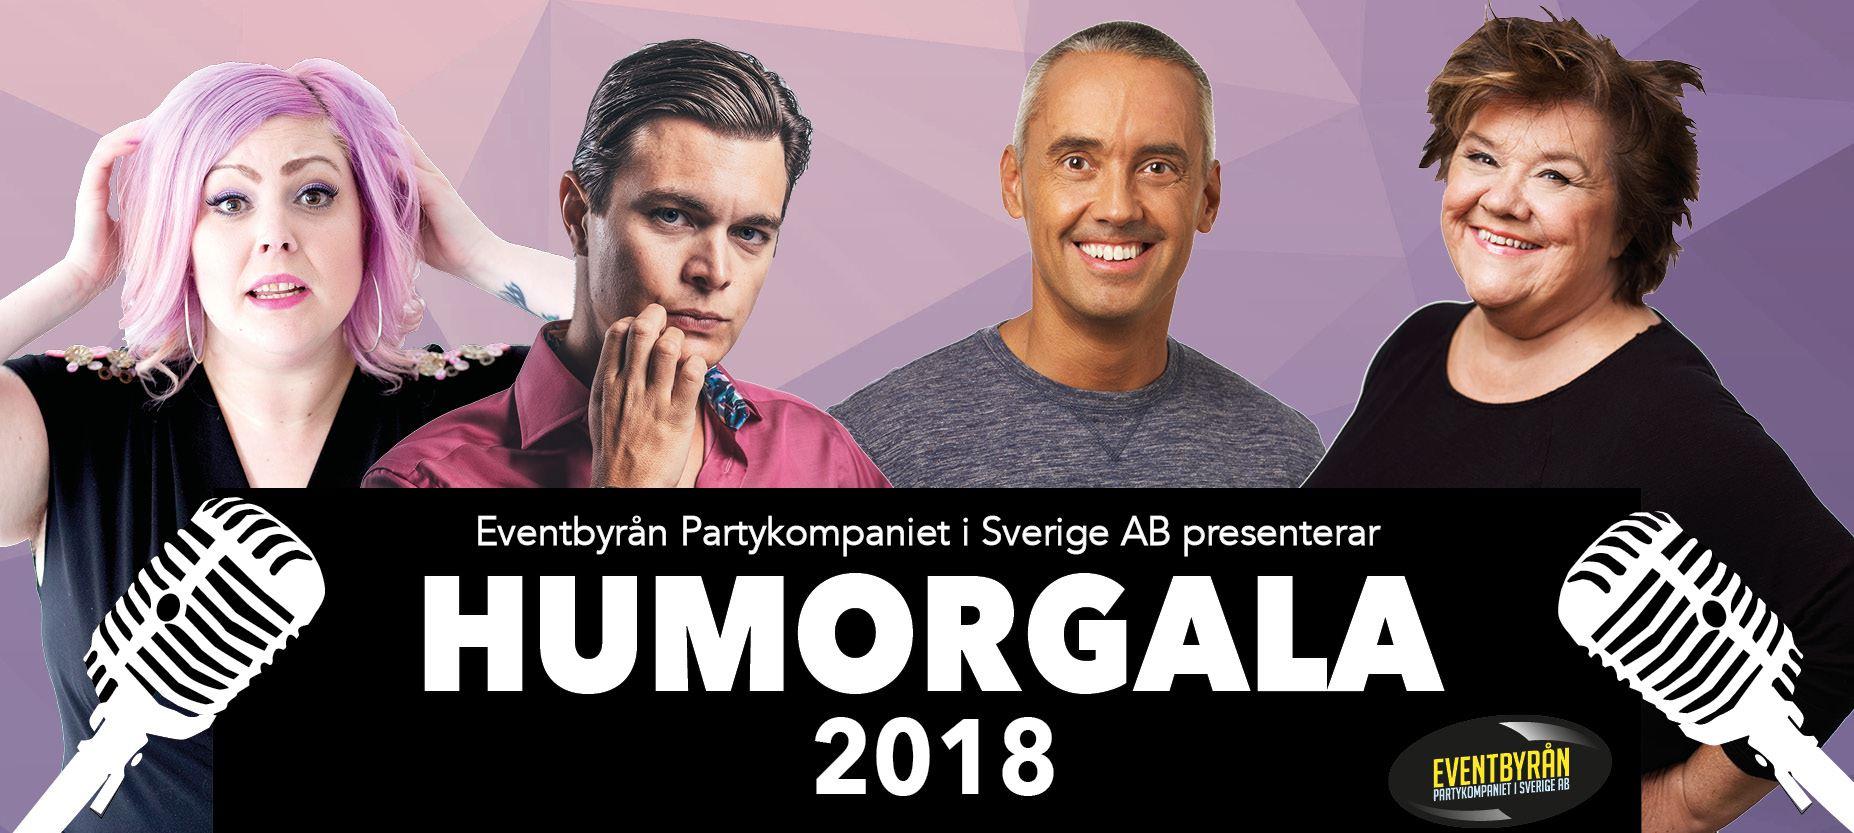 Humorgala 2018